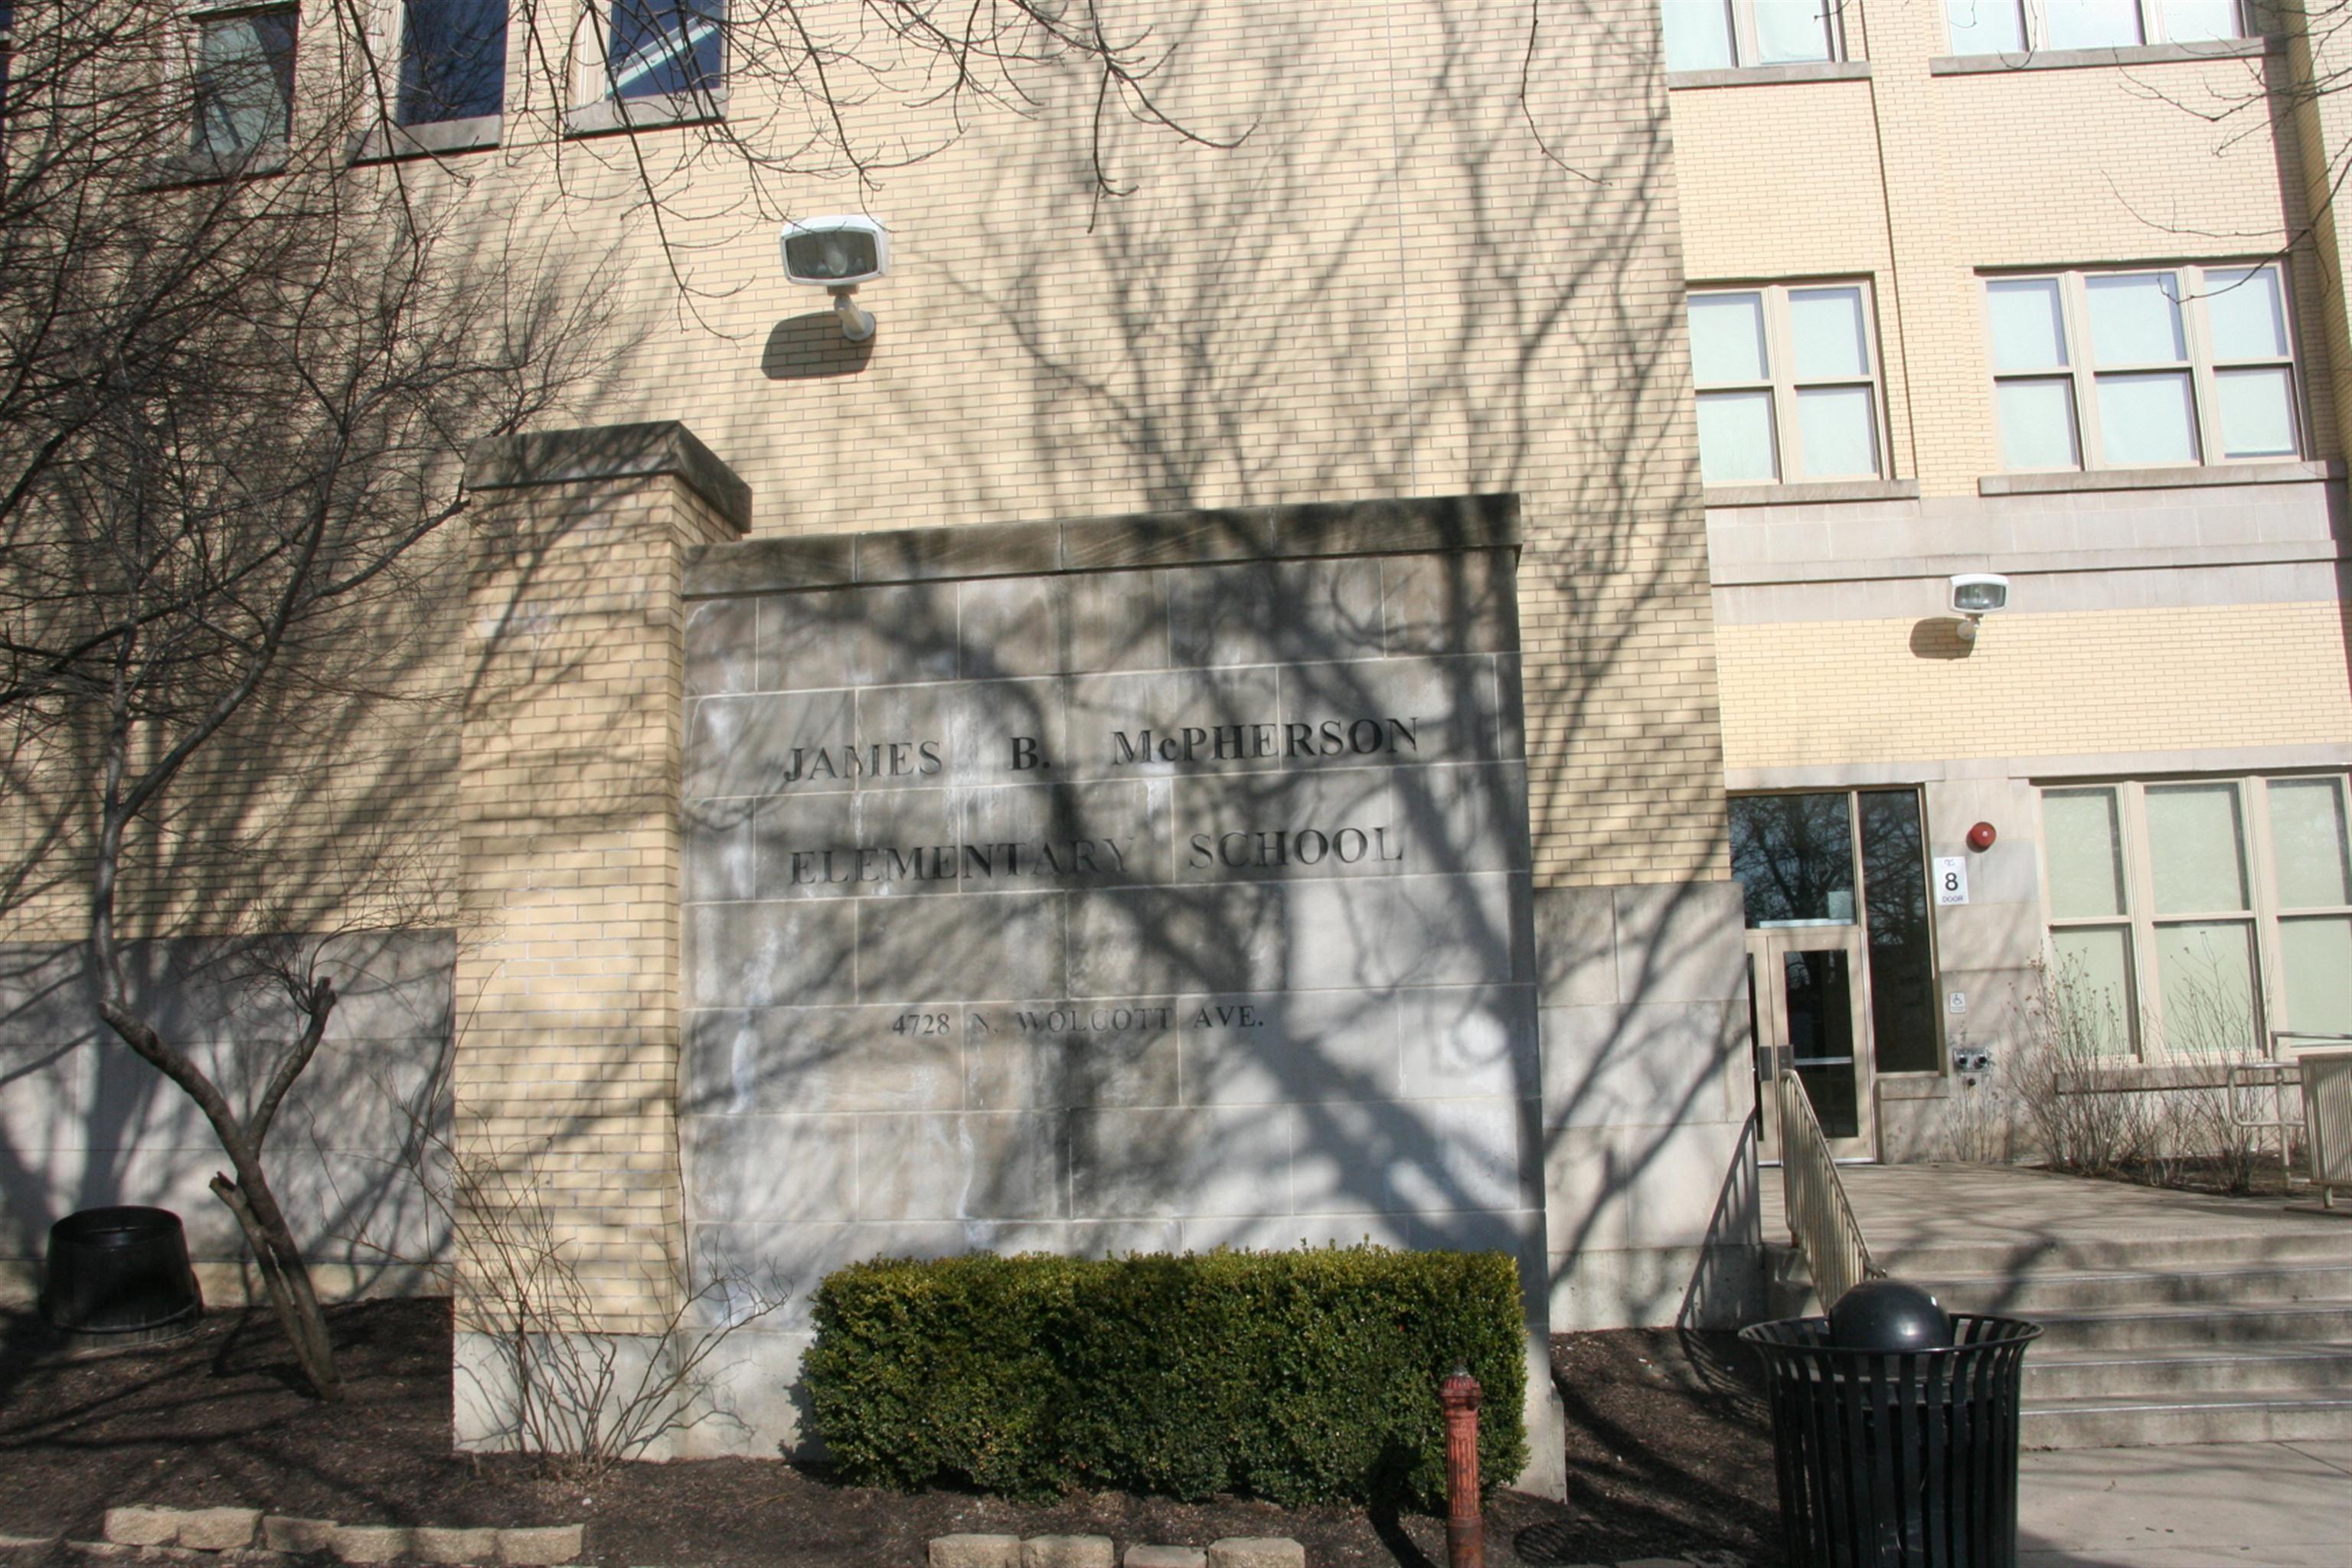 featured image James B McPherson Elementary School